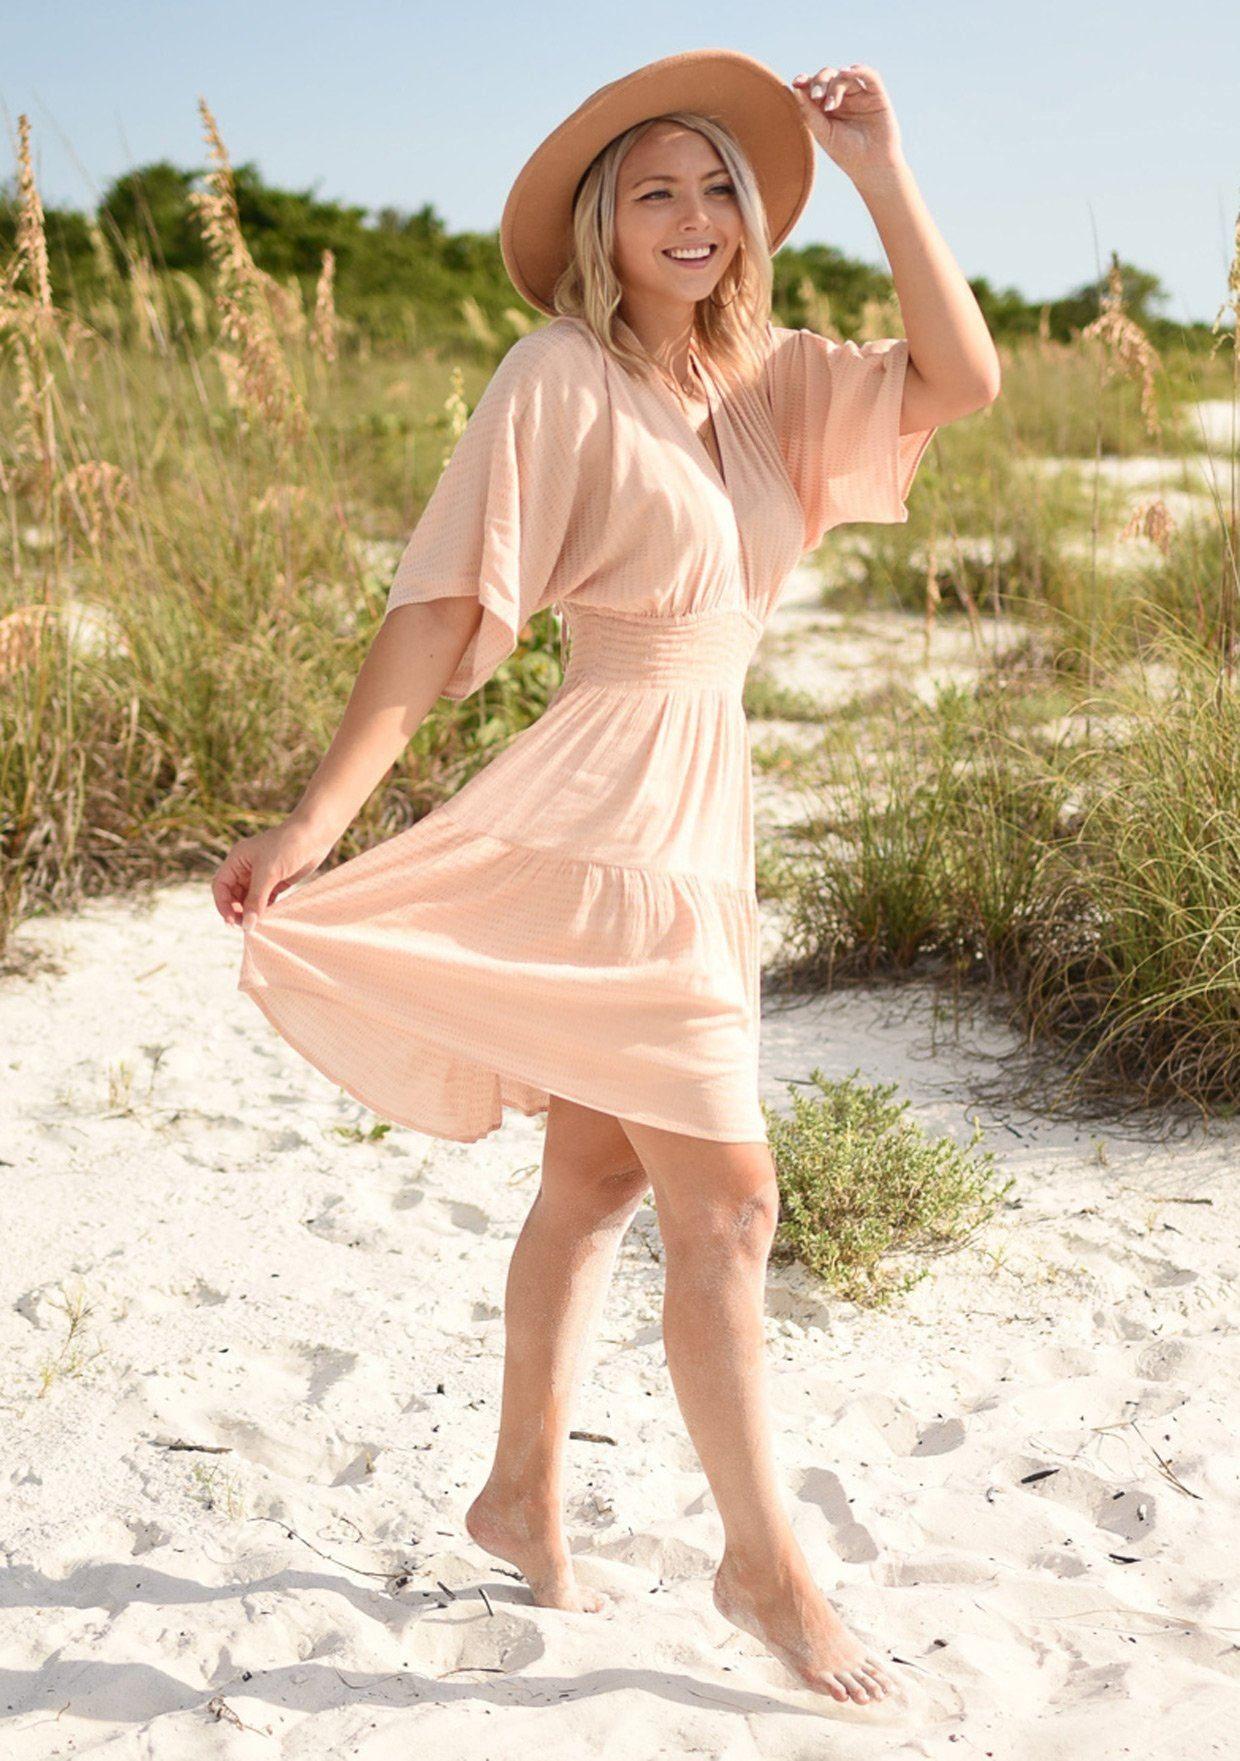 Easy Street Boho Mini Dress Lovestitch In 2021 Boho Mini Dress Pretty Mini Dresses Mini Dress With Sleeves [ 1761 x 1240 Pixel ]